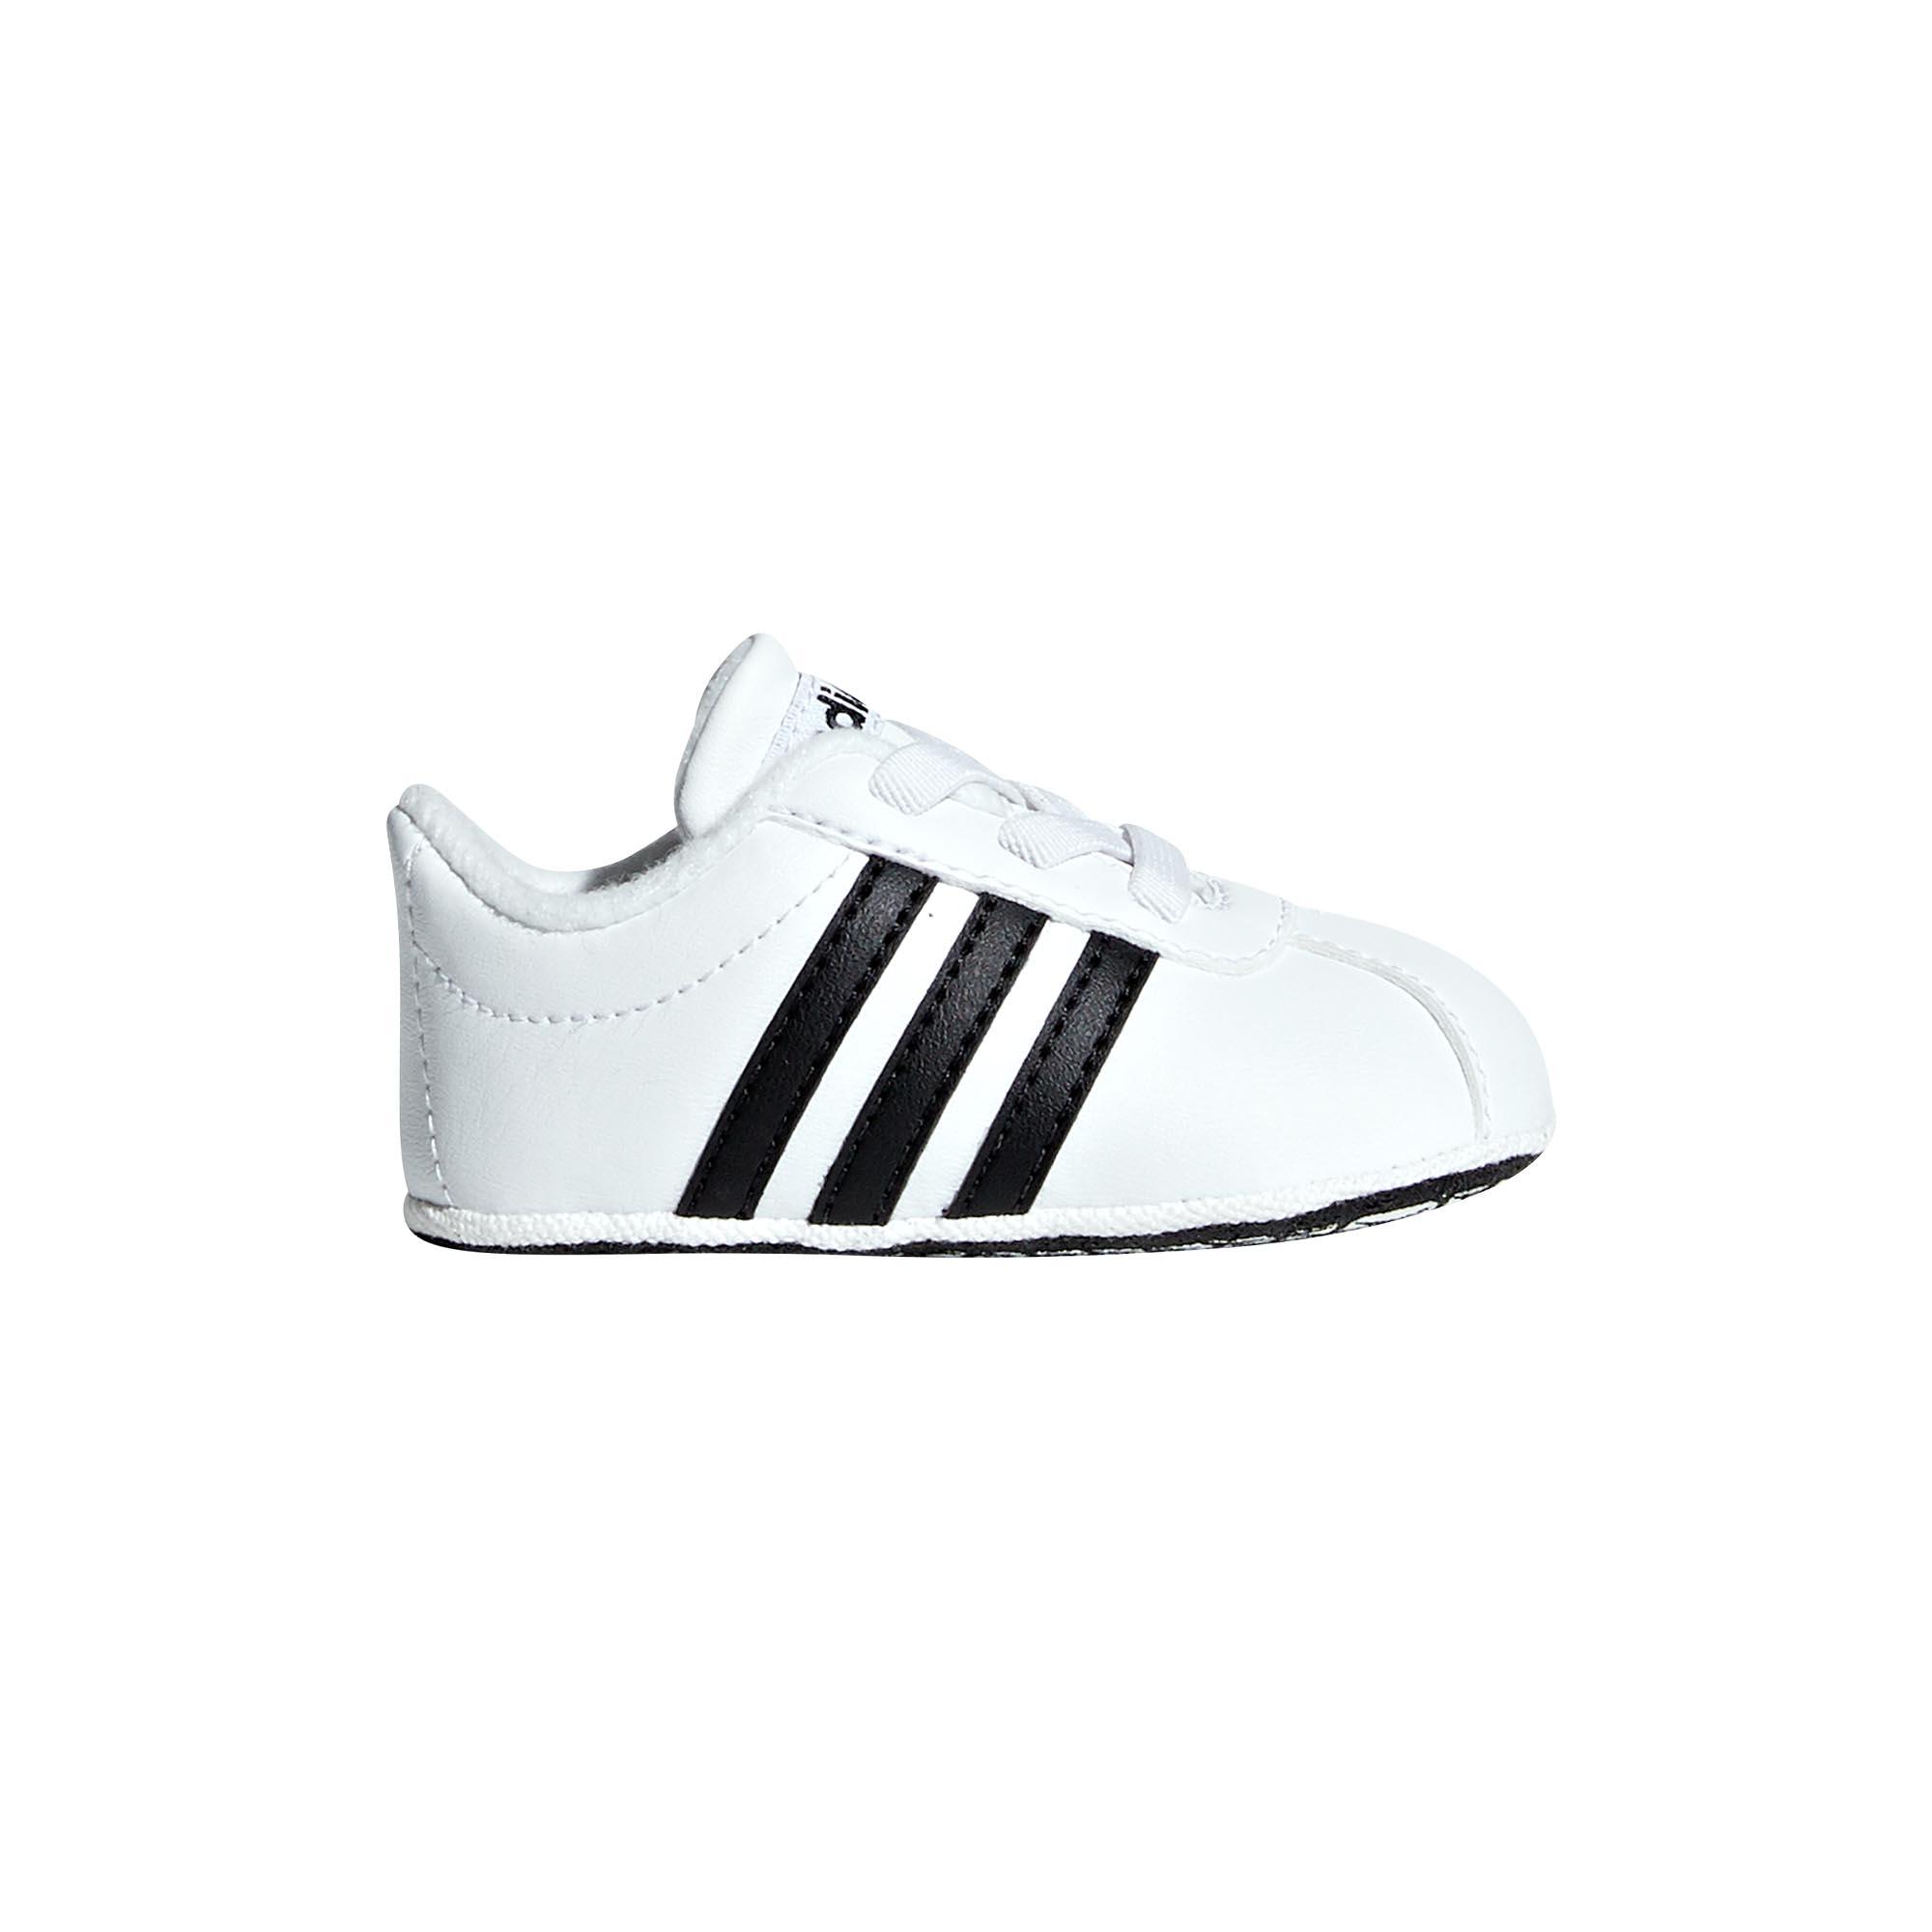 Details about adidas VL Court 2.0 Infant Baby Toddler Kids Boys Crib Shoe WhiteBlack UK 1